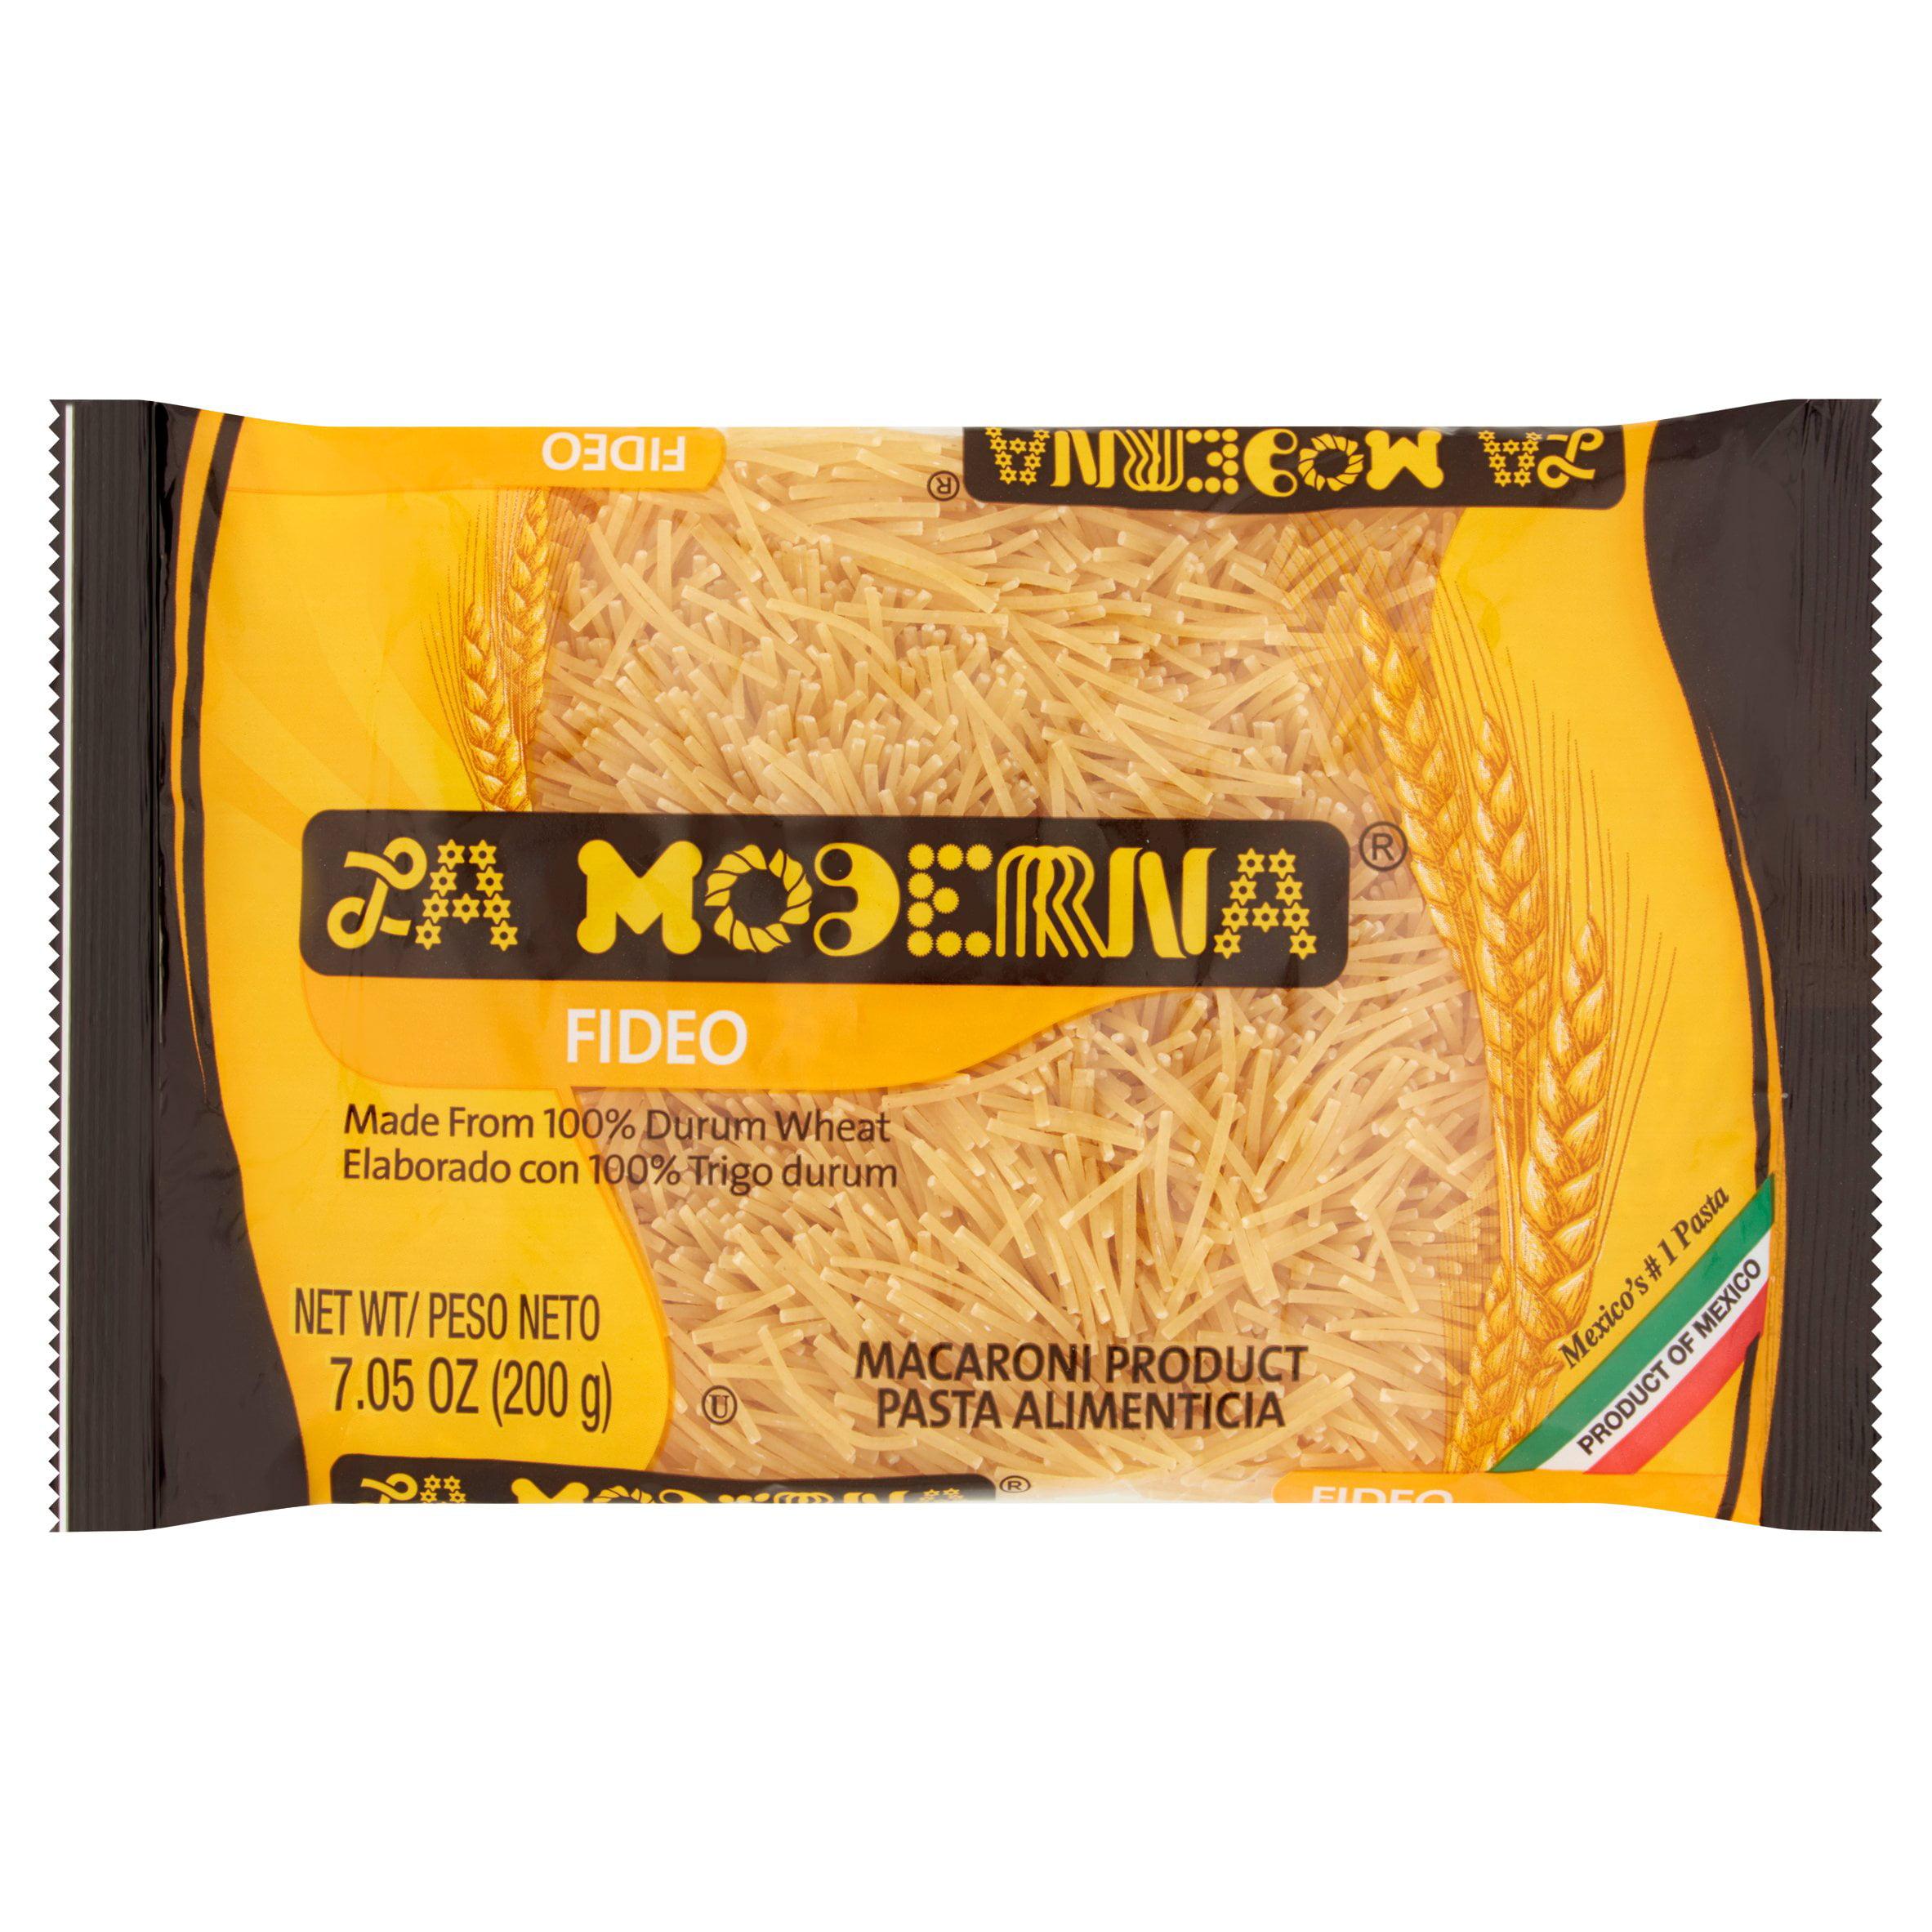 (5 Pack) La Moderna Fideo Macaroni, 7.05 oz